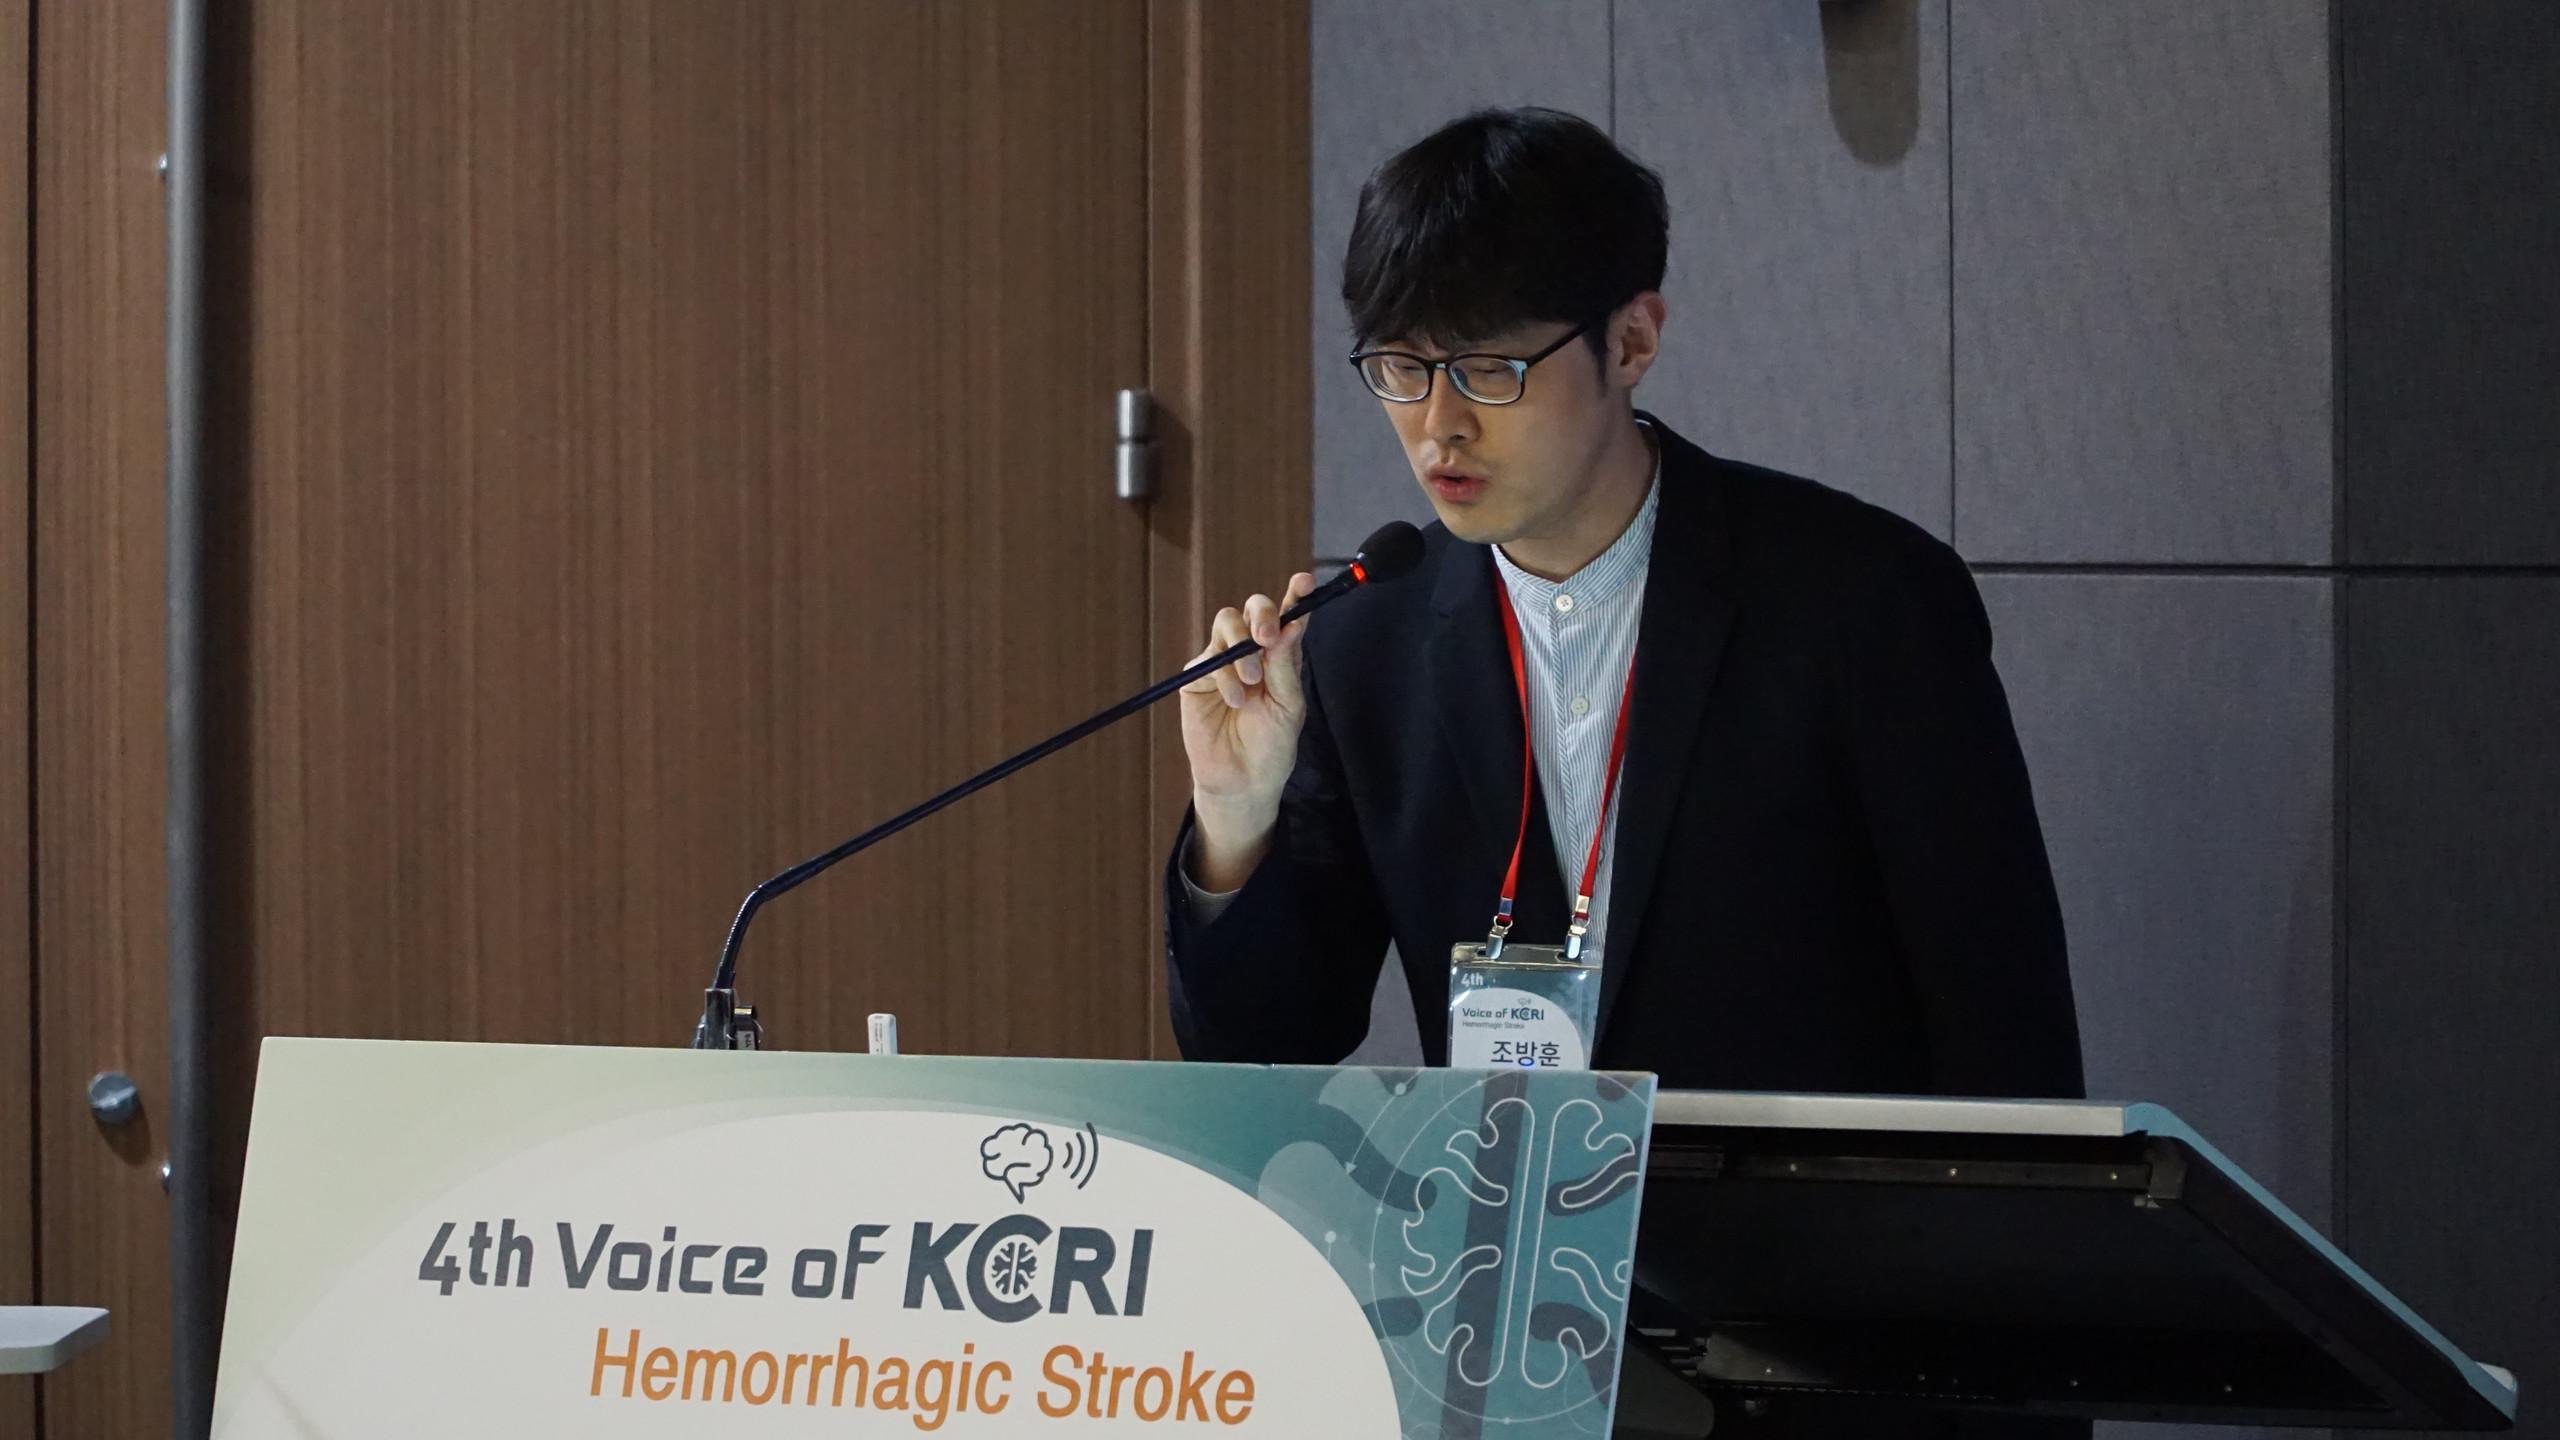 4th Voice of KCRI_19